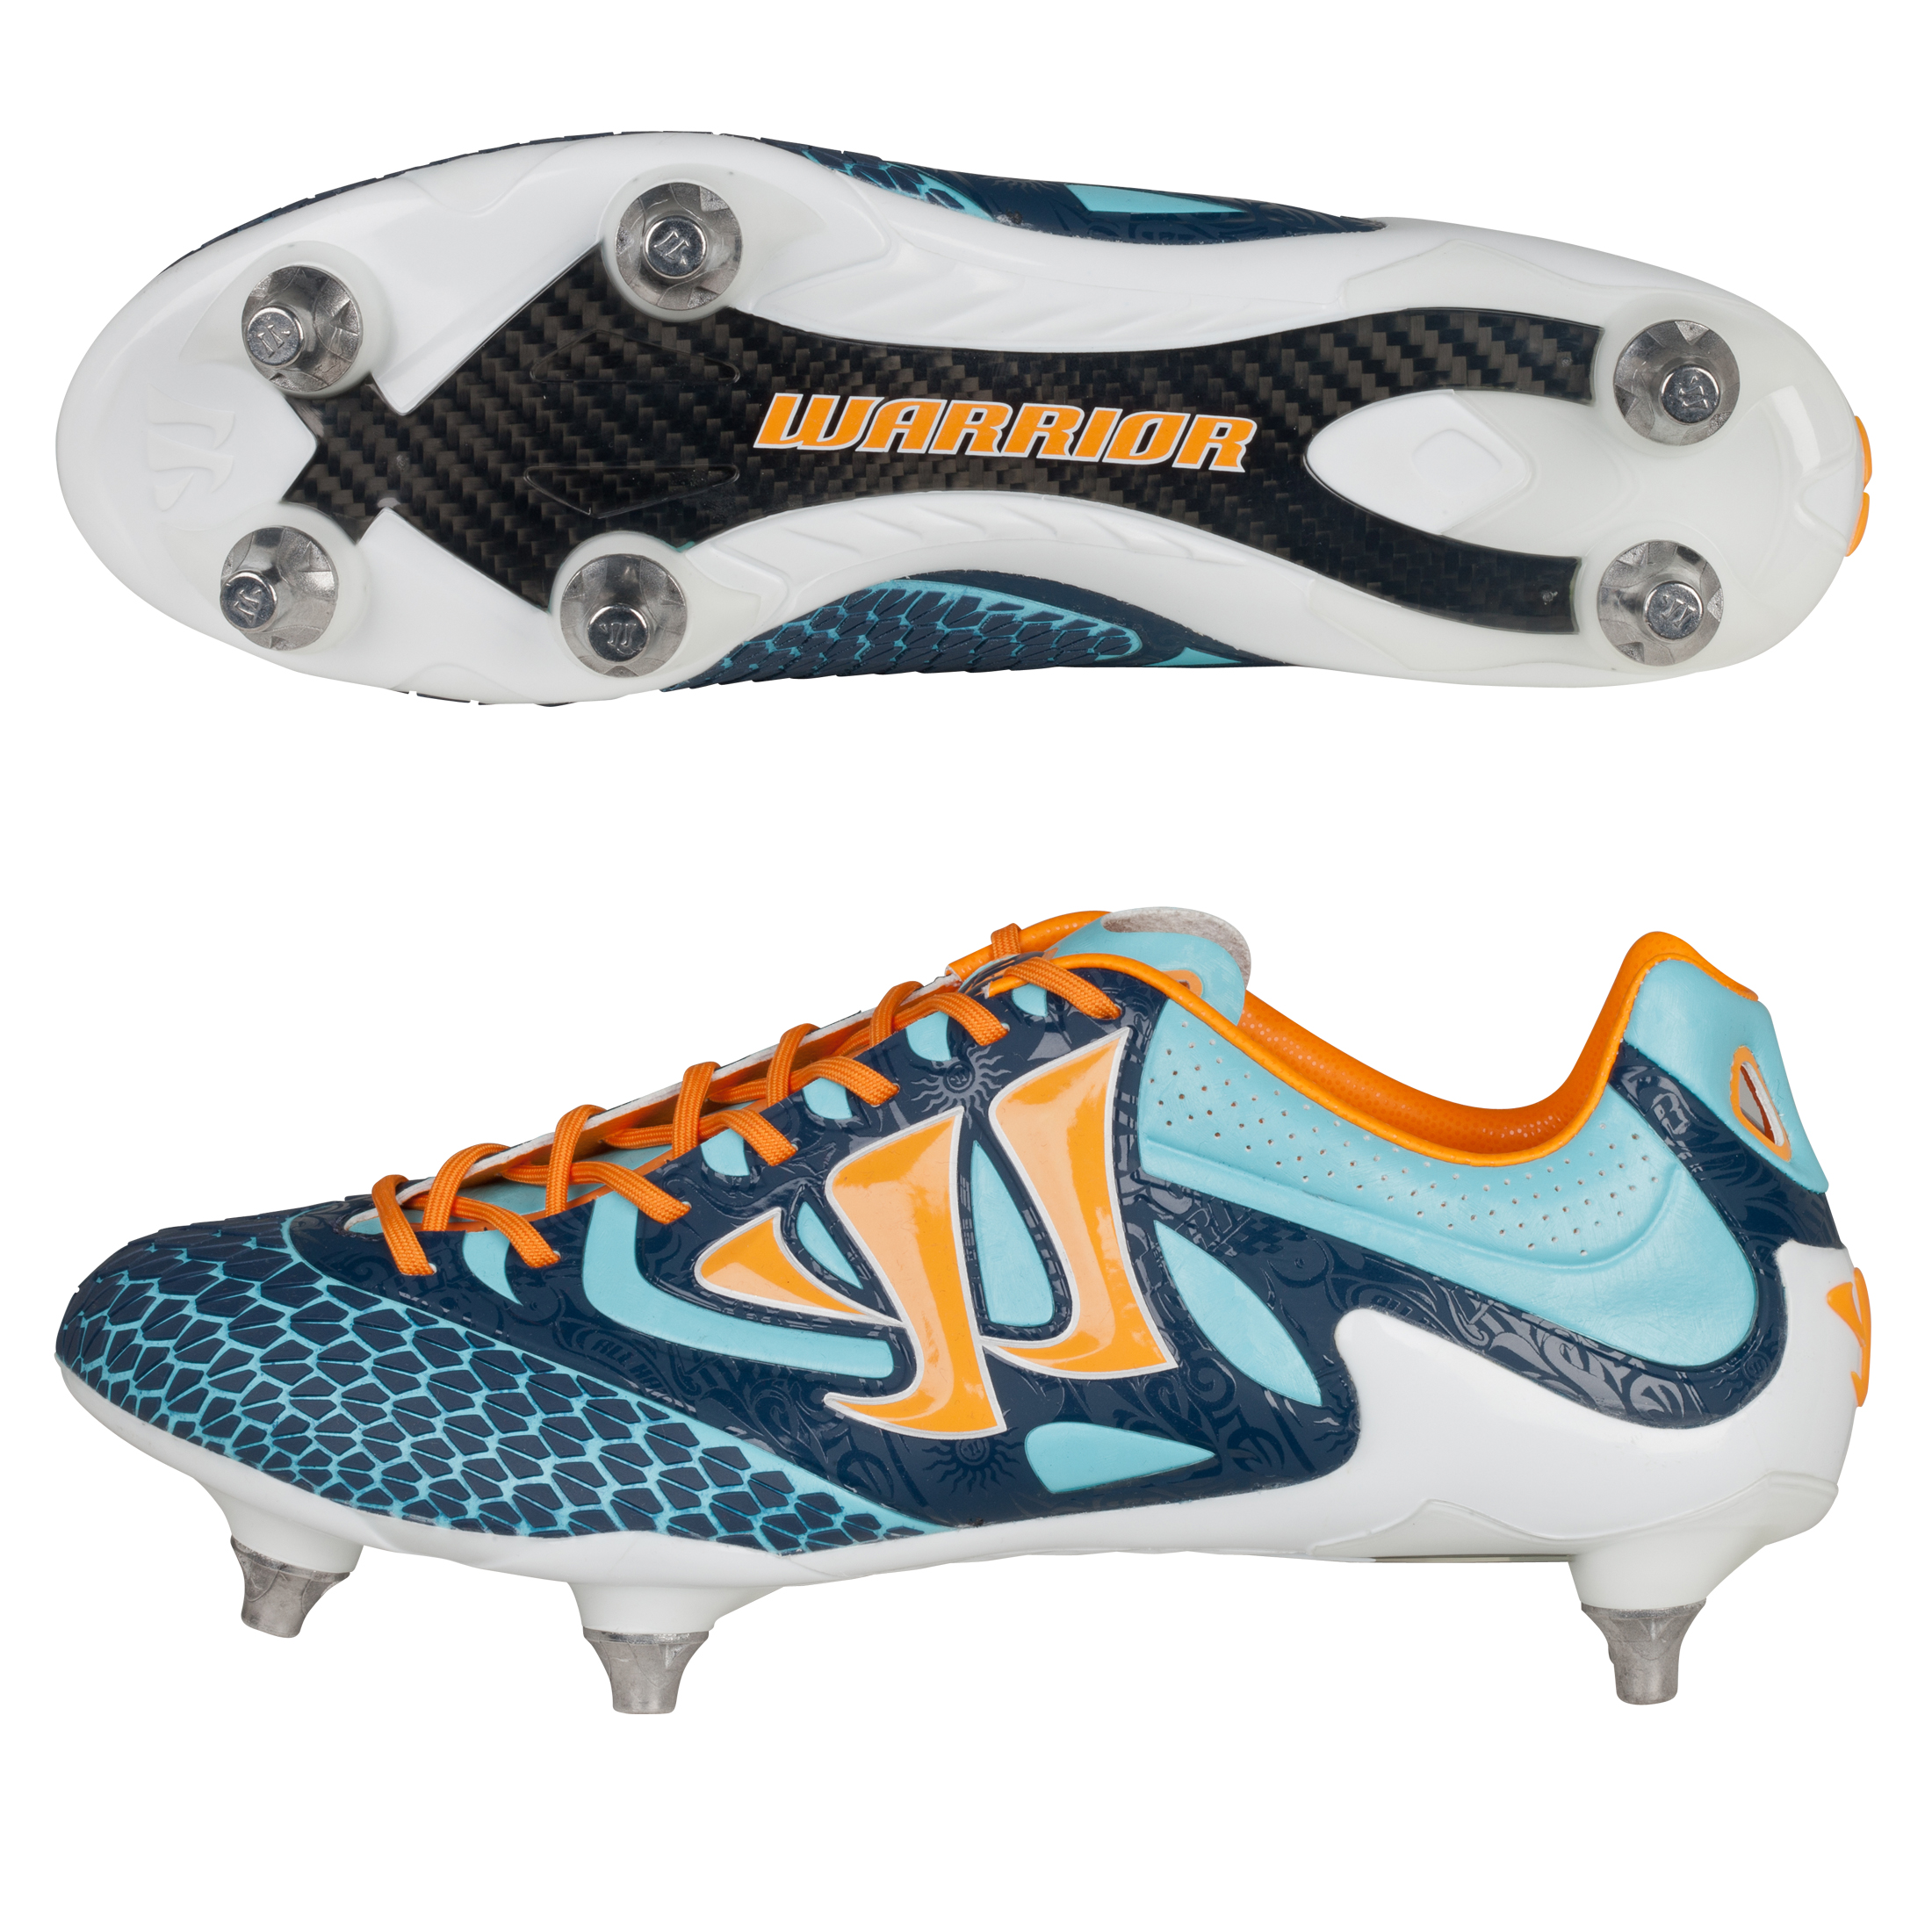 Warrior Sports Skreamer S-Lite Soft Ground Football Boots - Blue Radiance/Bright Marigold/Insignia Blue